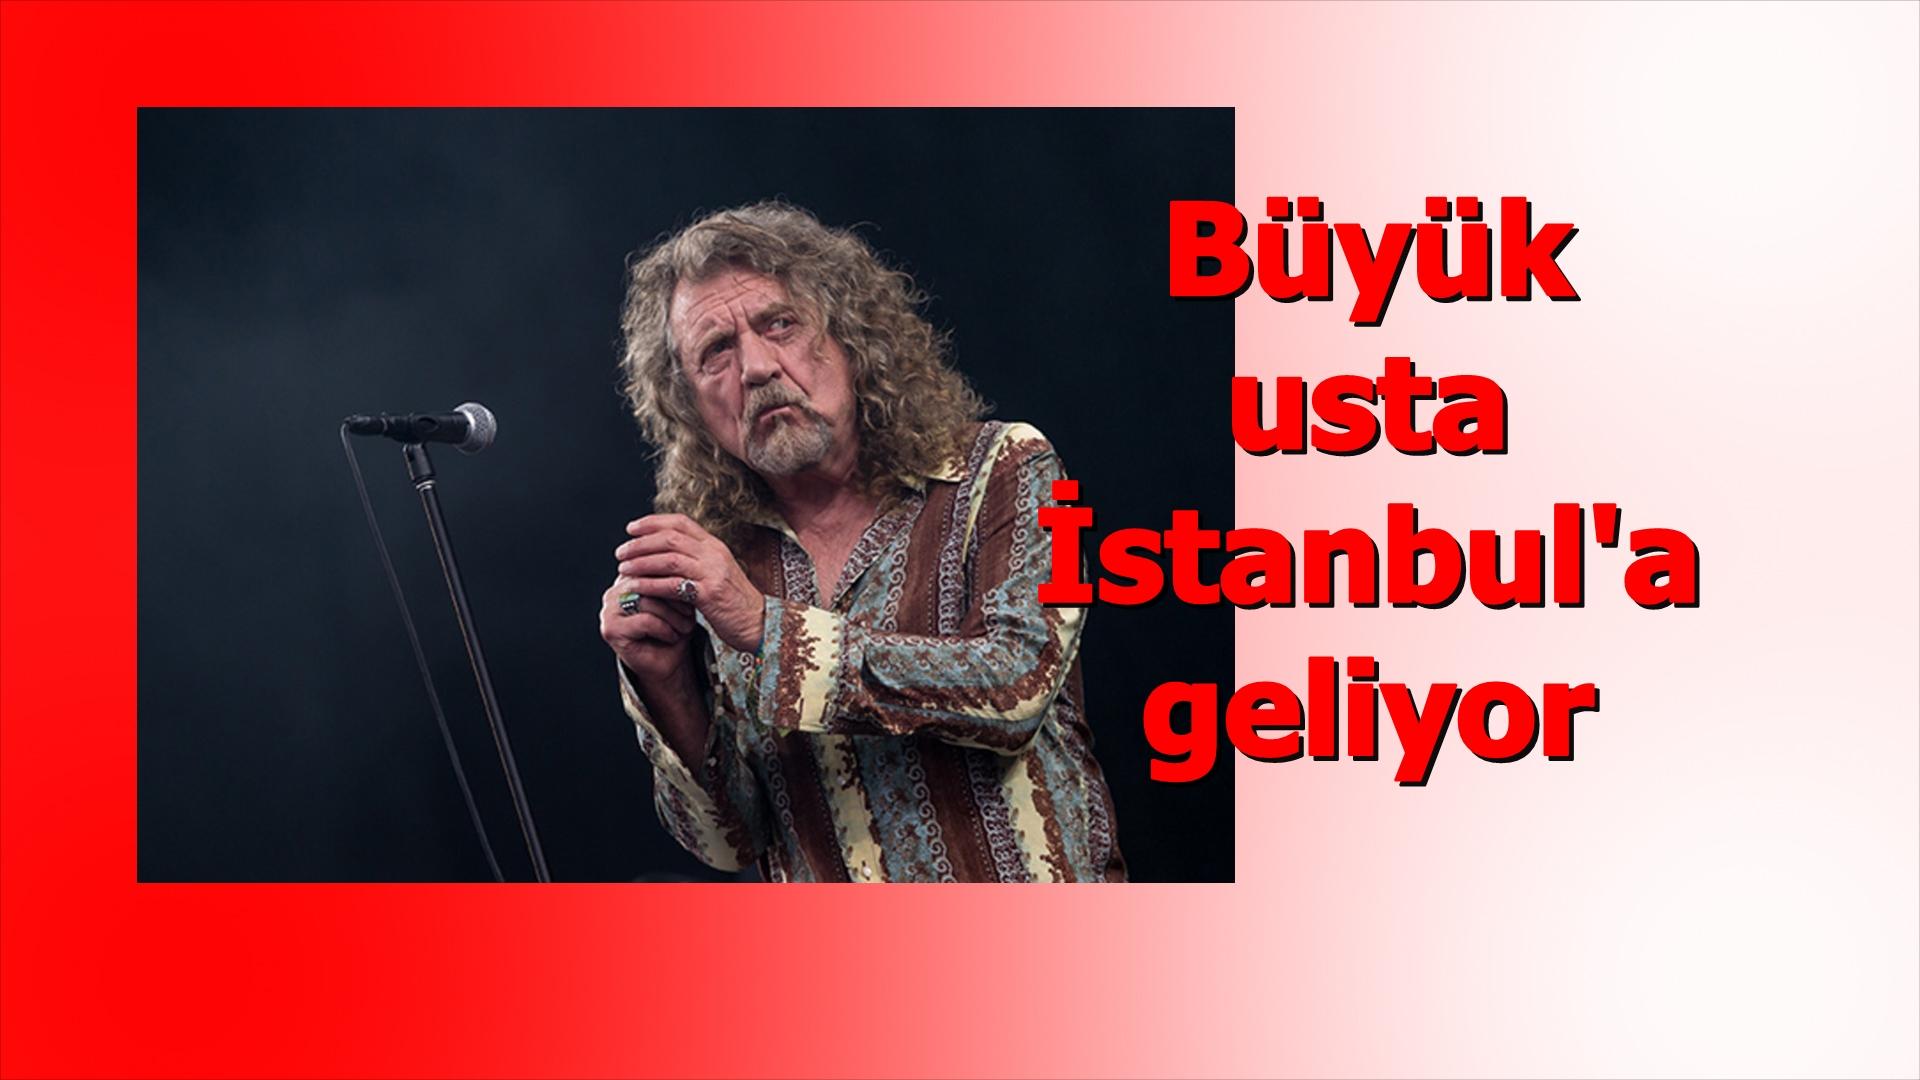 Caz Festivali, Robert Plant'le kapanıyor